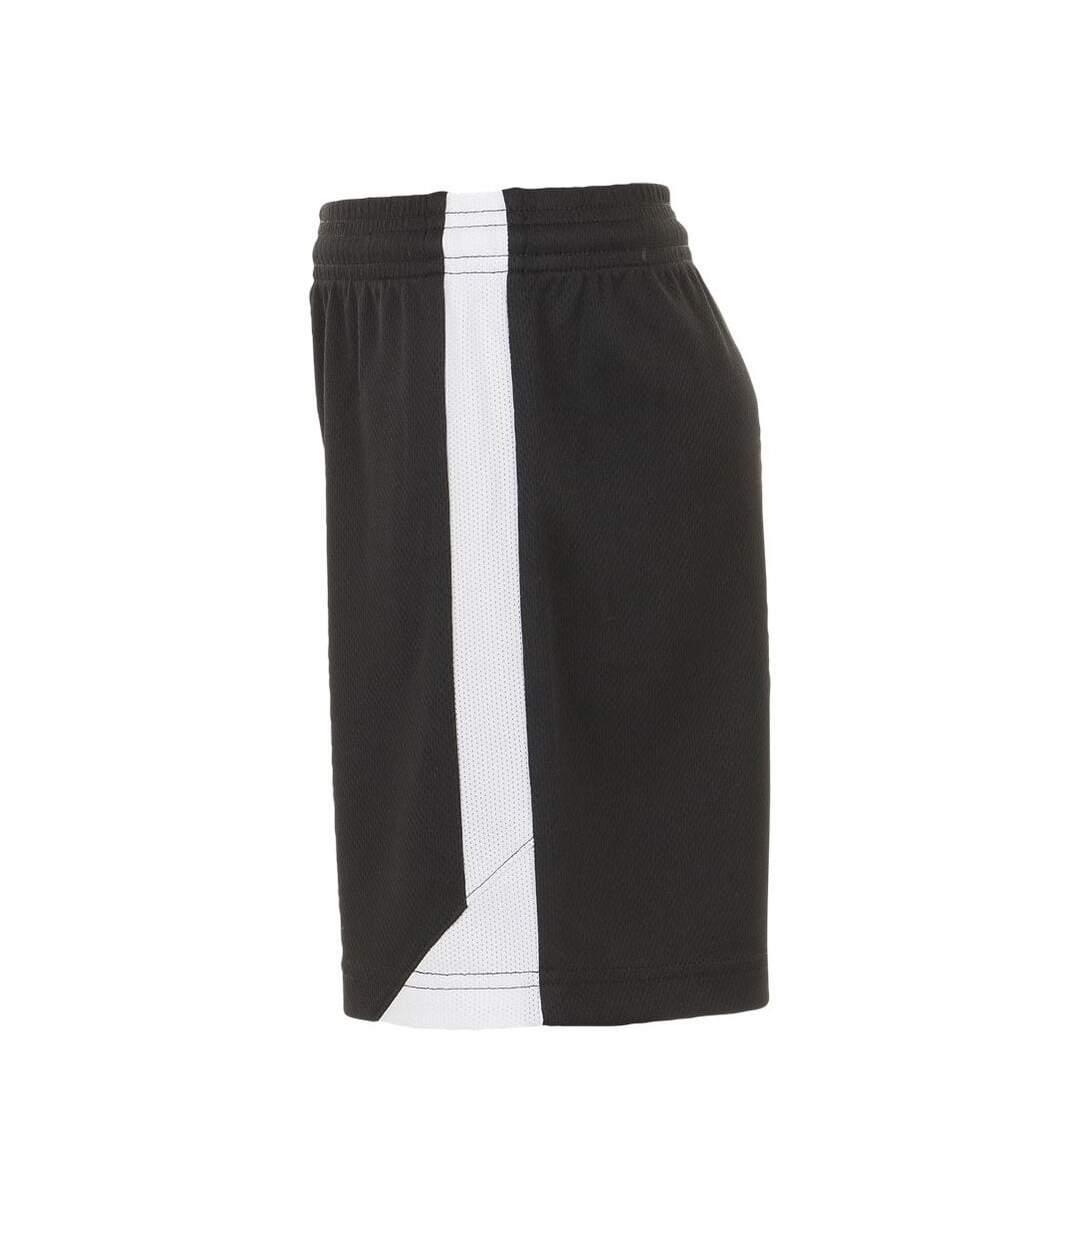 SOLS Mens Olimpico Football Shorts (Black/White) - UTPC2788